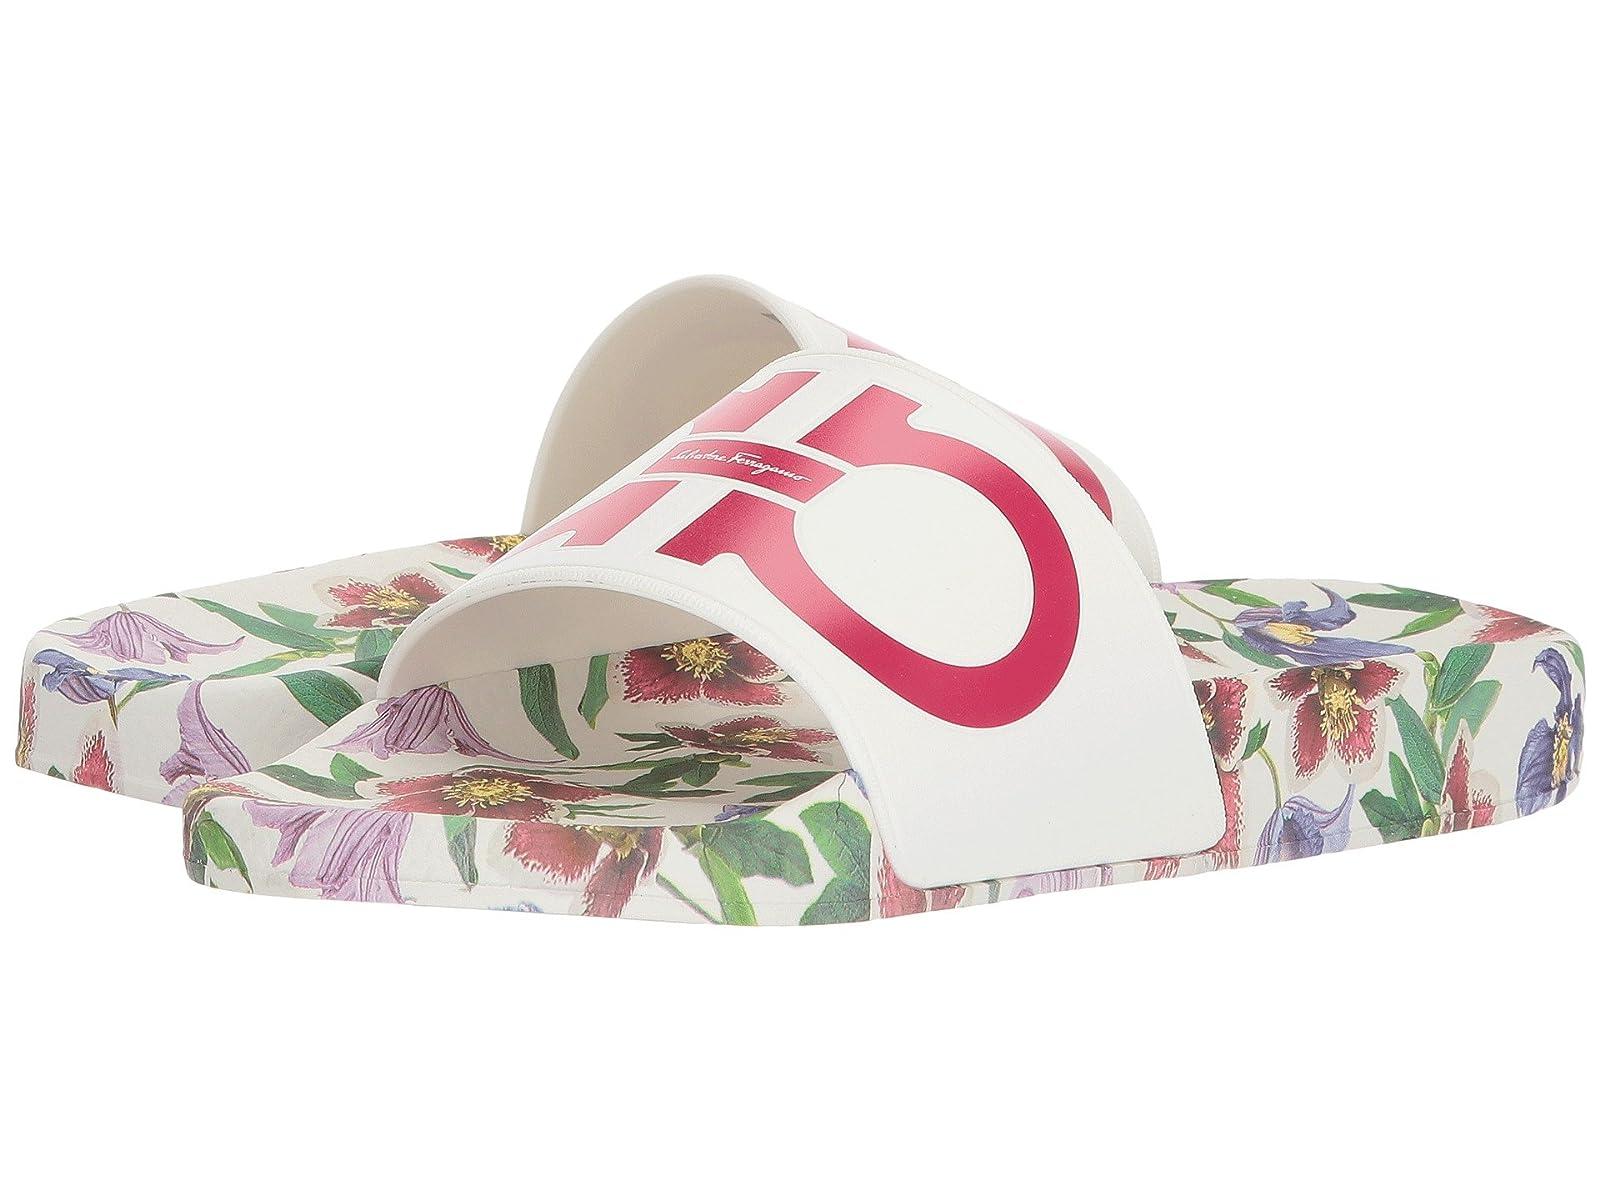 Salvatore Ferragamo PVC Pool SlideCheap and distinctive eye-catching shoes